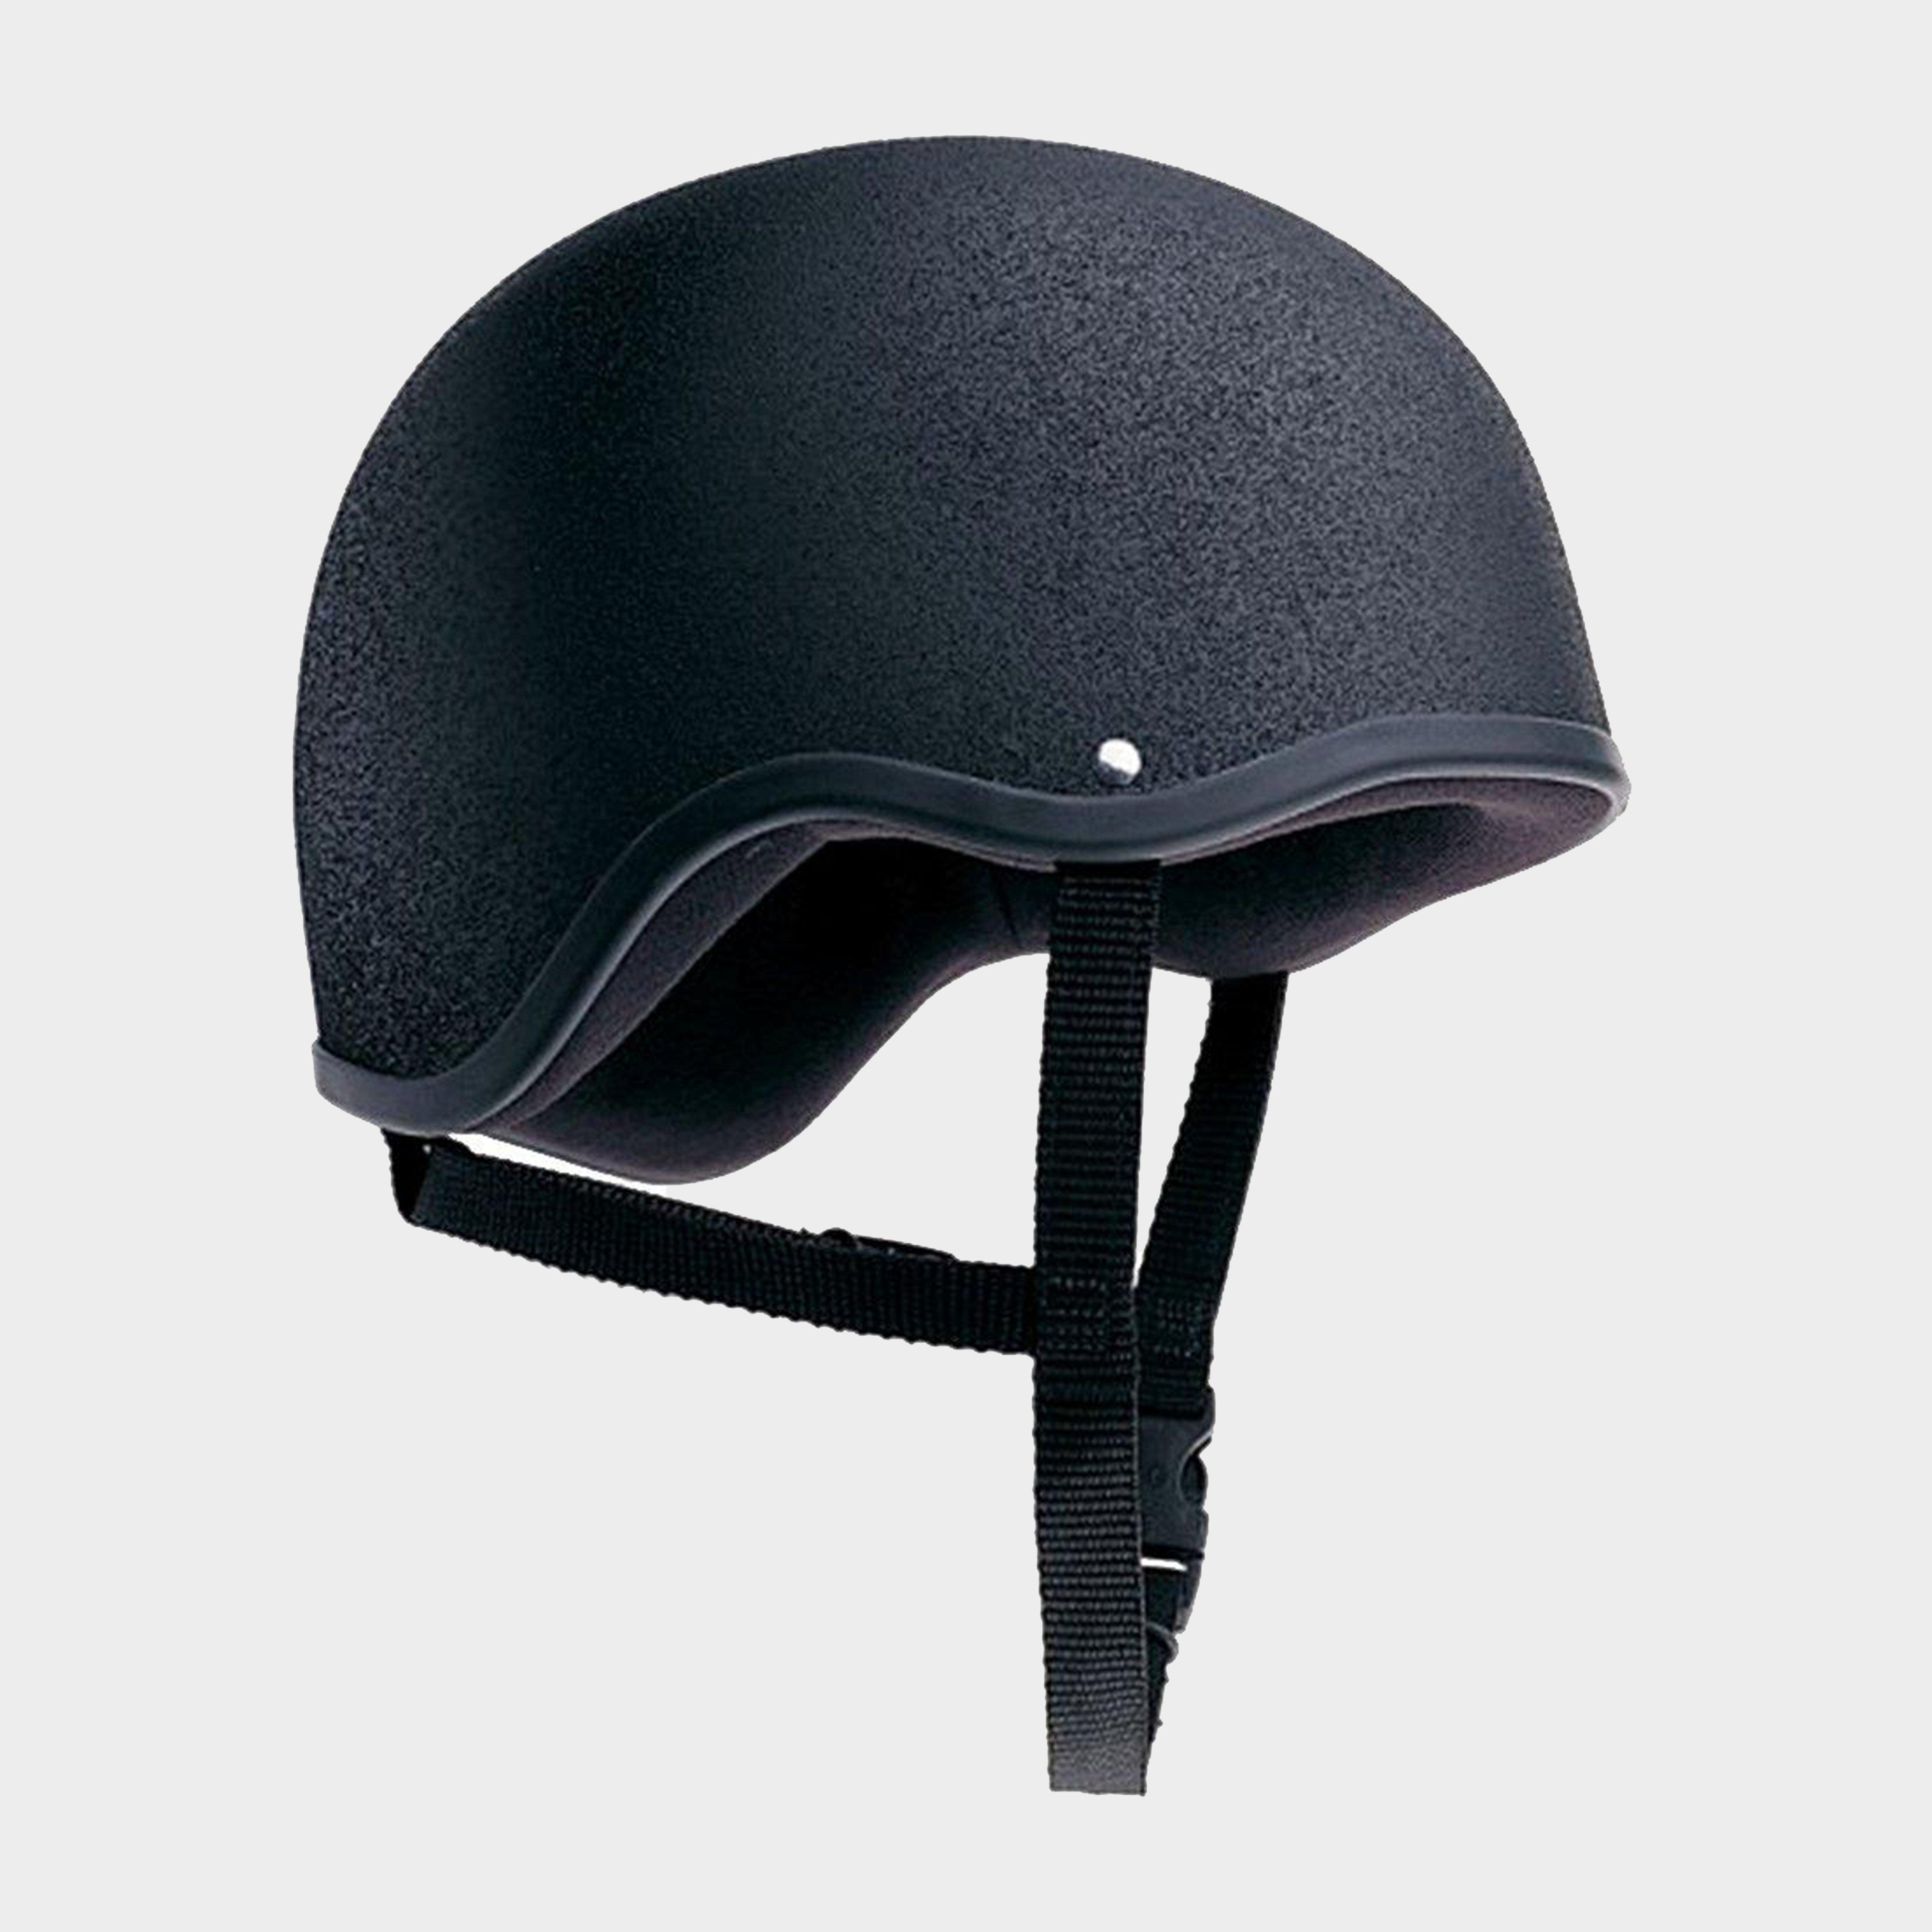 Image of Champion Junior Plus Riding Helmet - Navy/Navy, NAVY/NAVY